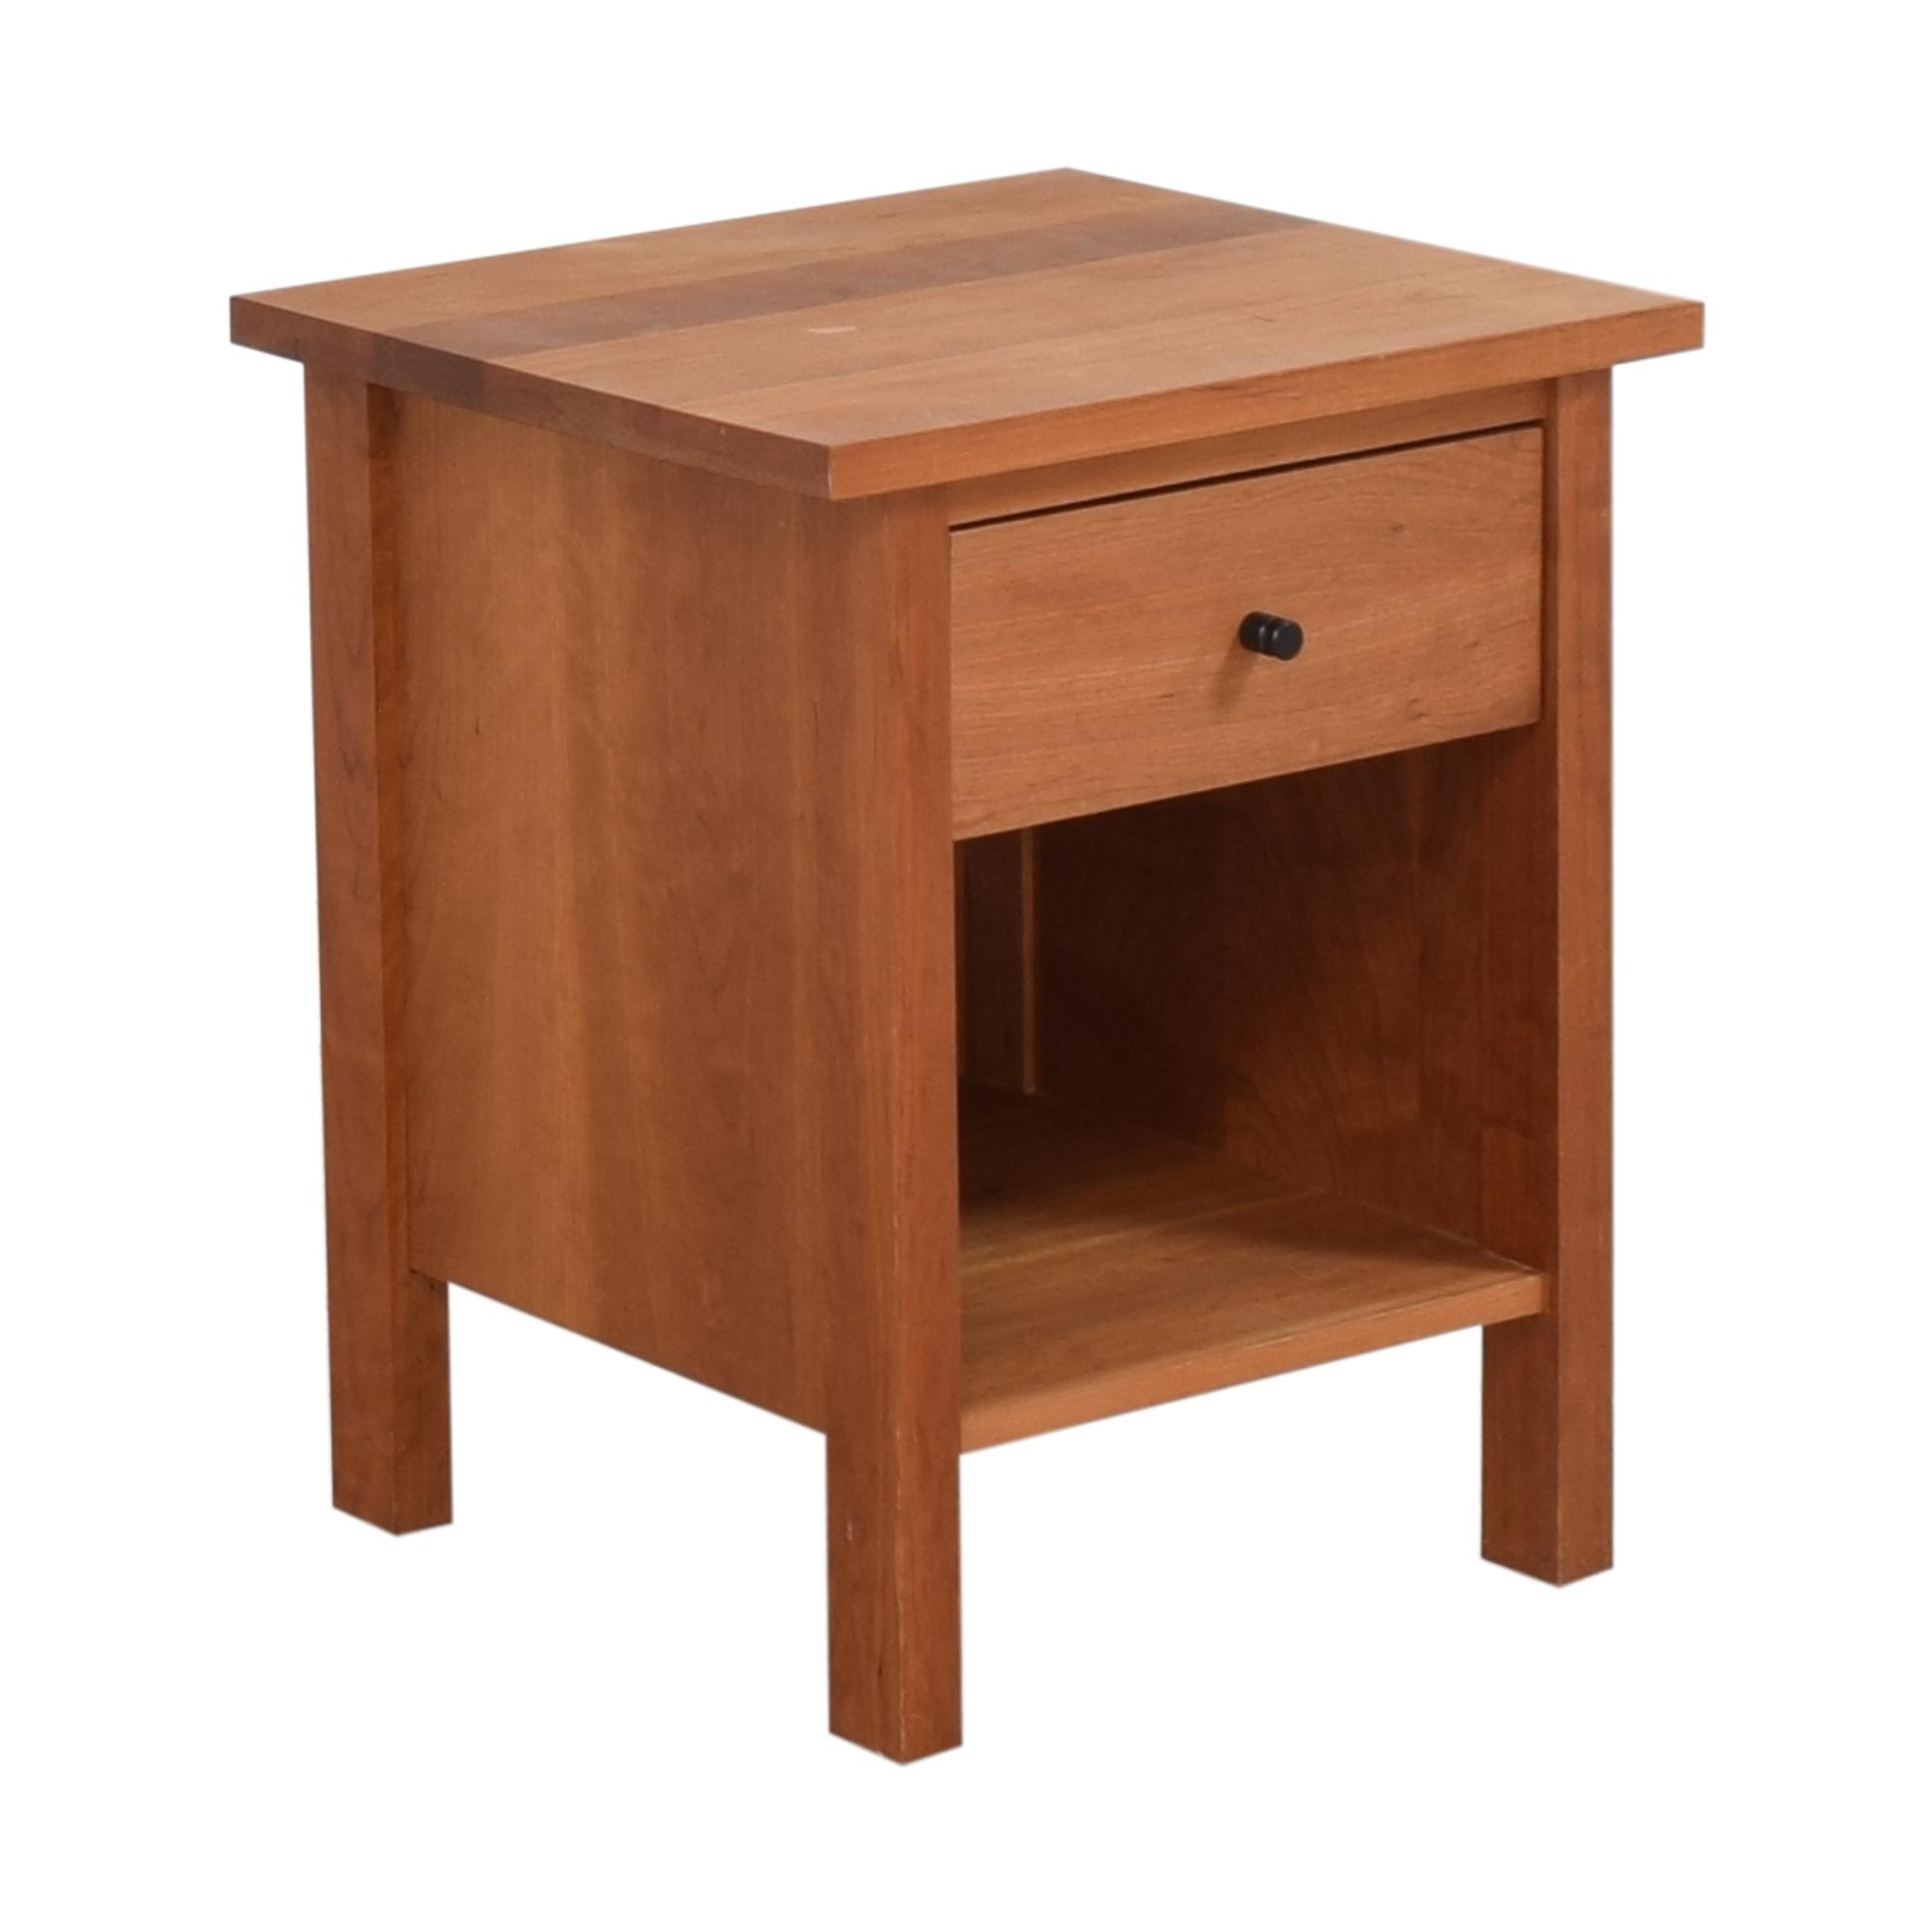 Room & Board Room & Board Sherwood Single Drawer Nightstand discount